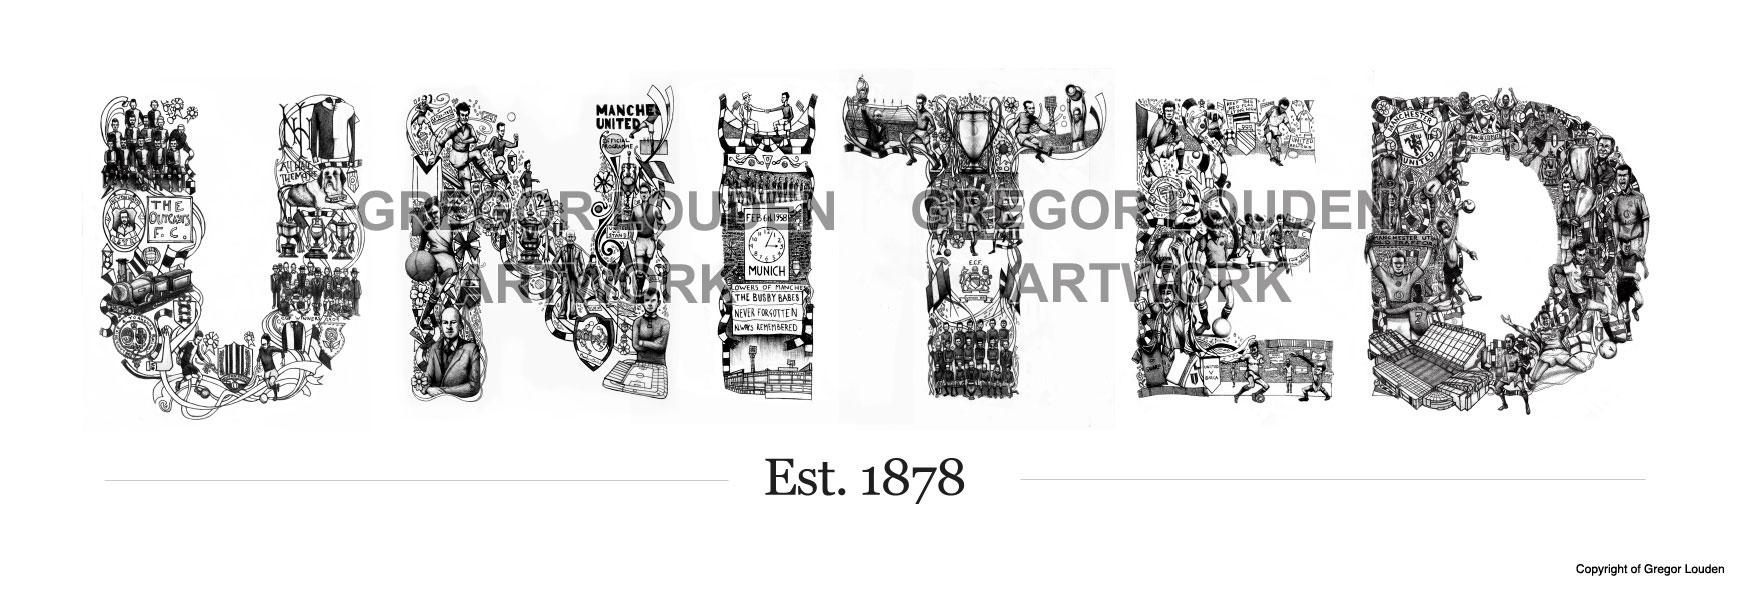 Manchester United Tribute Art Louden Creative Illustration Design Buy Art Online